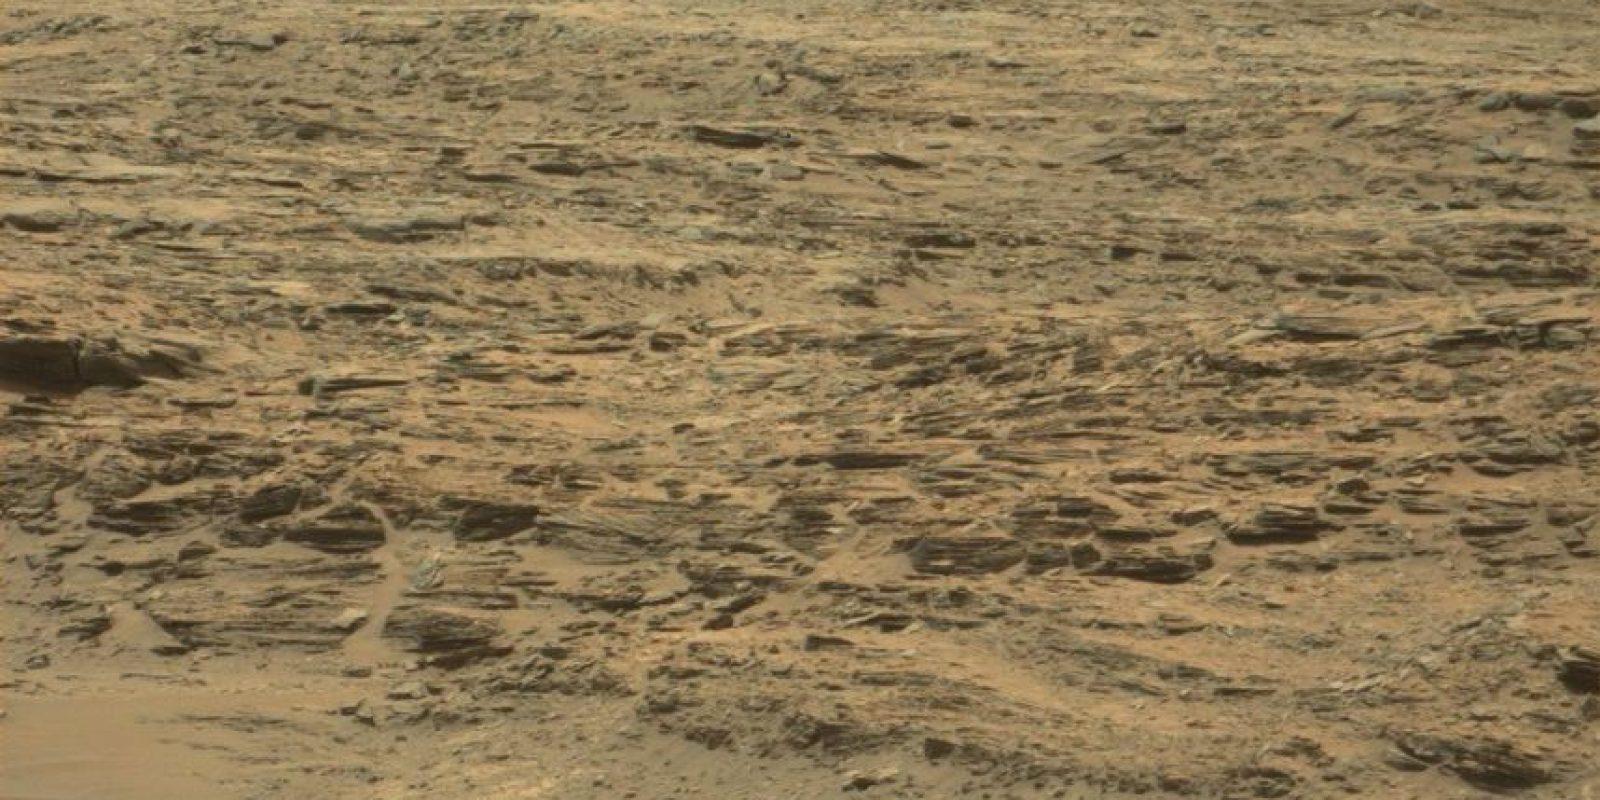 Foto:Imagen original en http://mars.jpl.nasa.gov/msl-raw-images/msss/01074/mcam/1074MR0047260040600095E01_DXXX.jpg